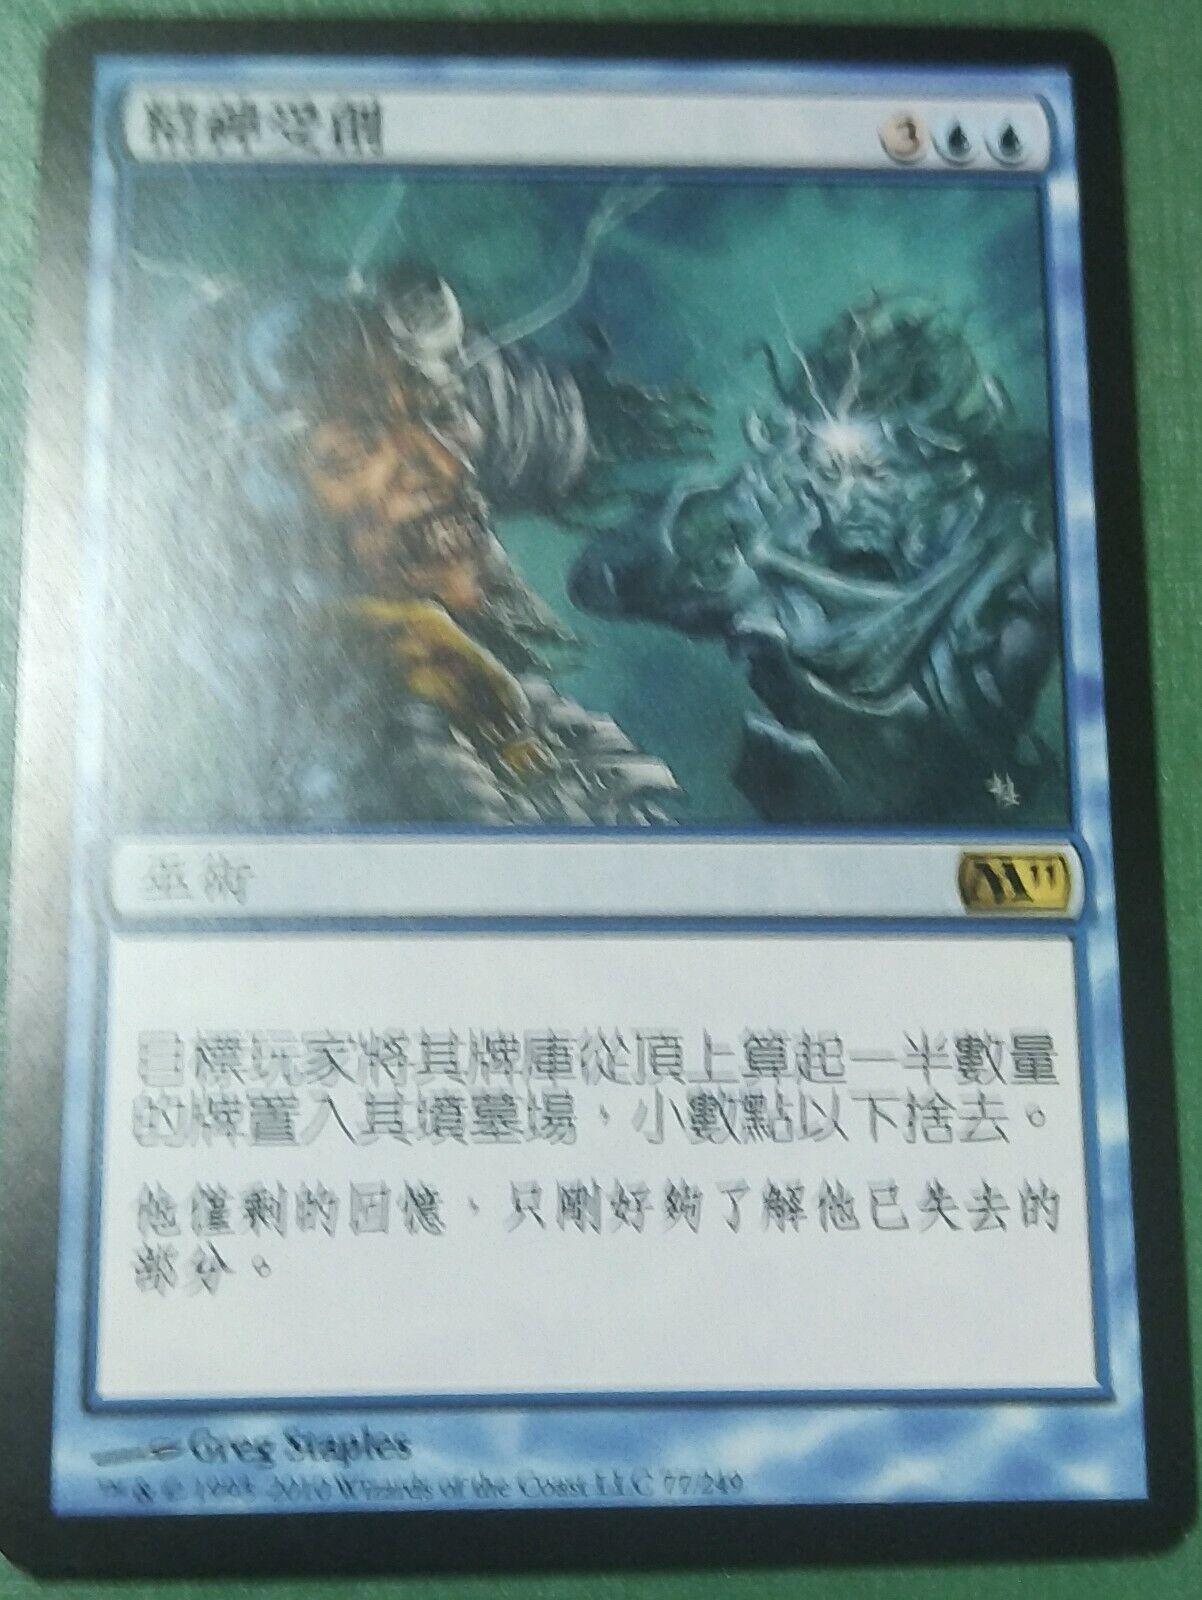 4 Redirect = Blue m11 Magic 2011 Mtg Magic Rare 4x x4